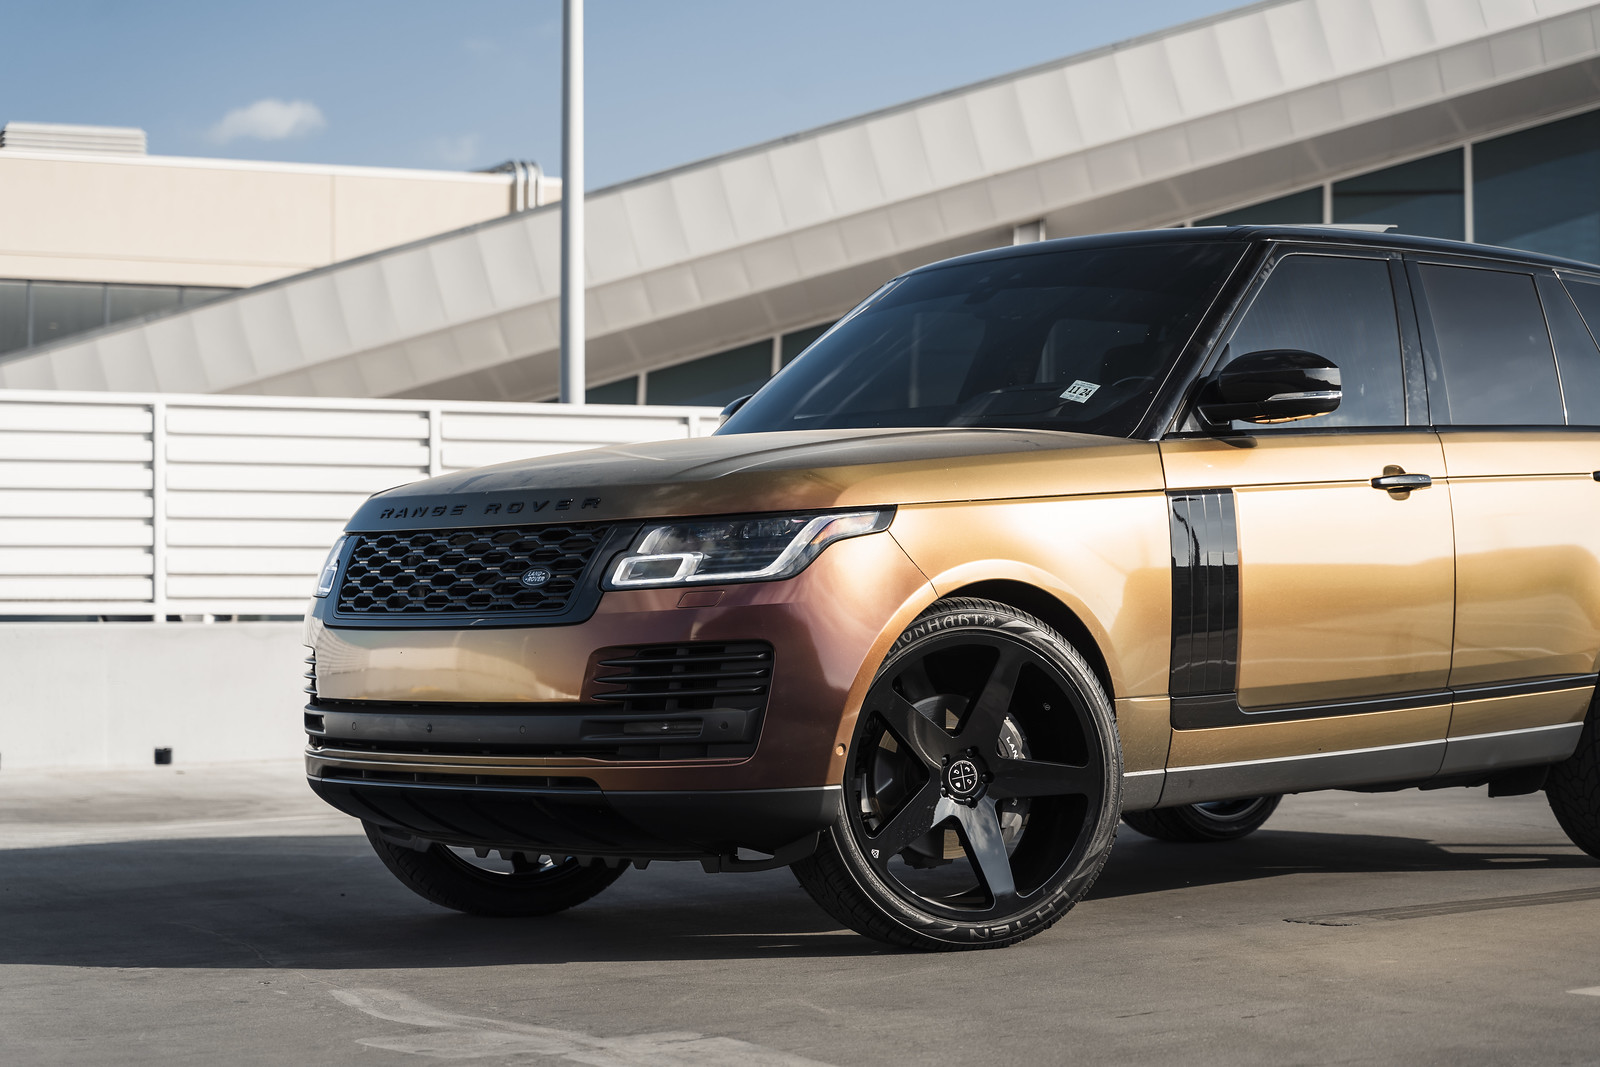 2020_Land_Rover_Range_Rover_HSC_BD15_Gloss_Black_3